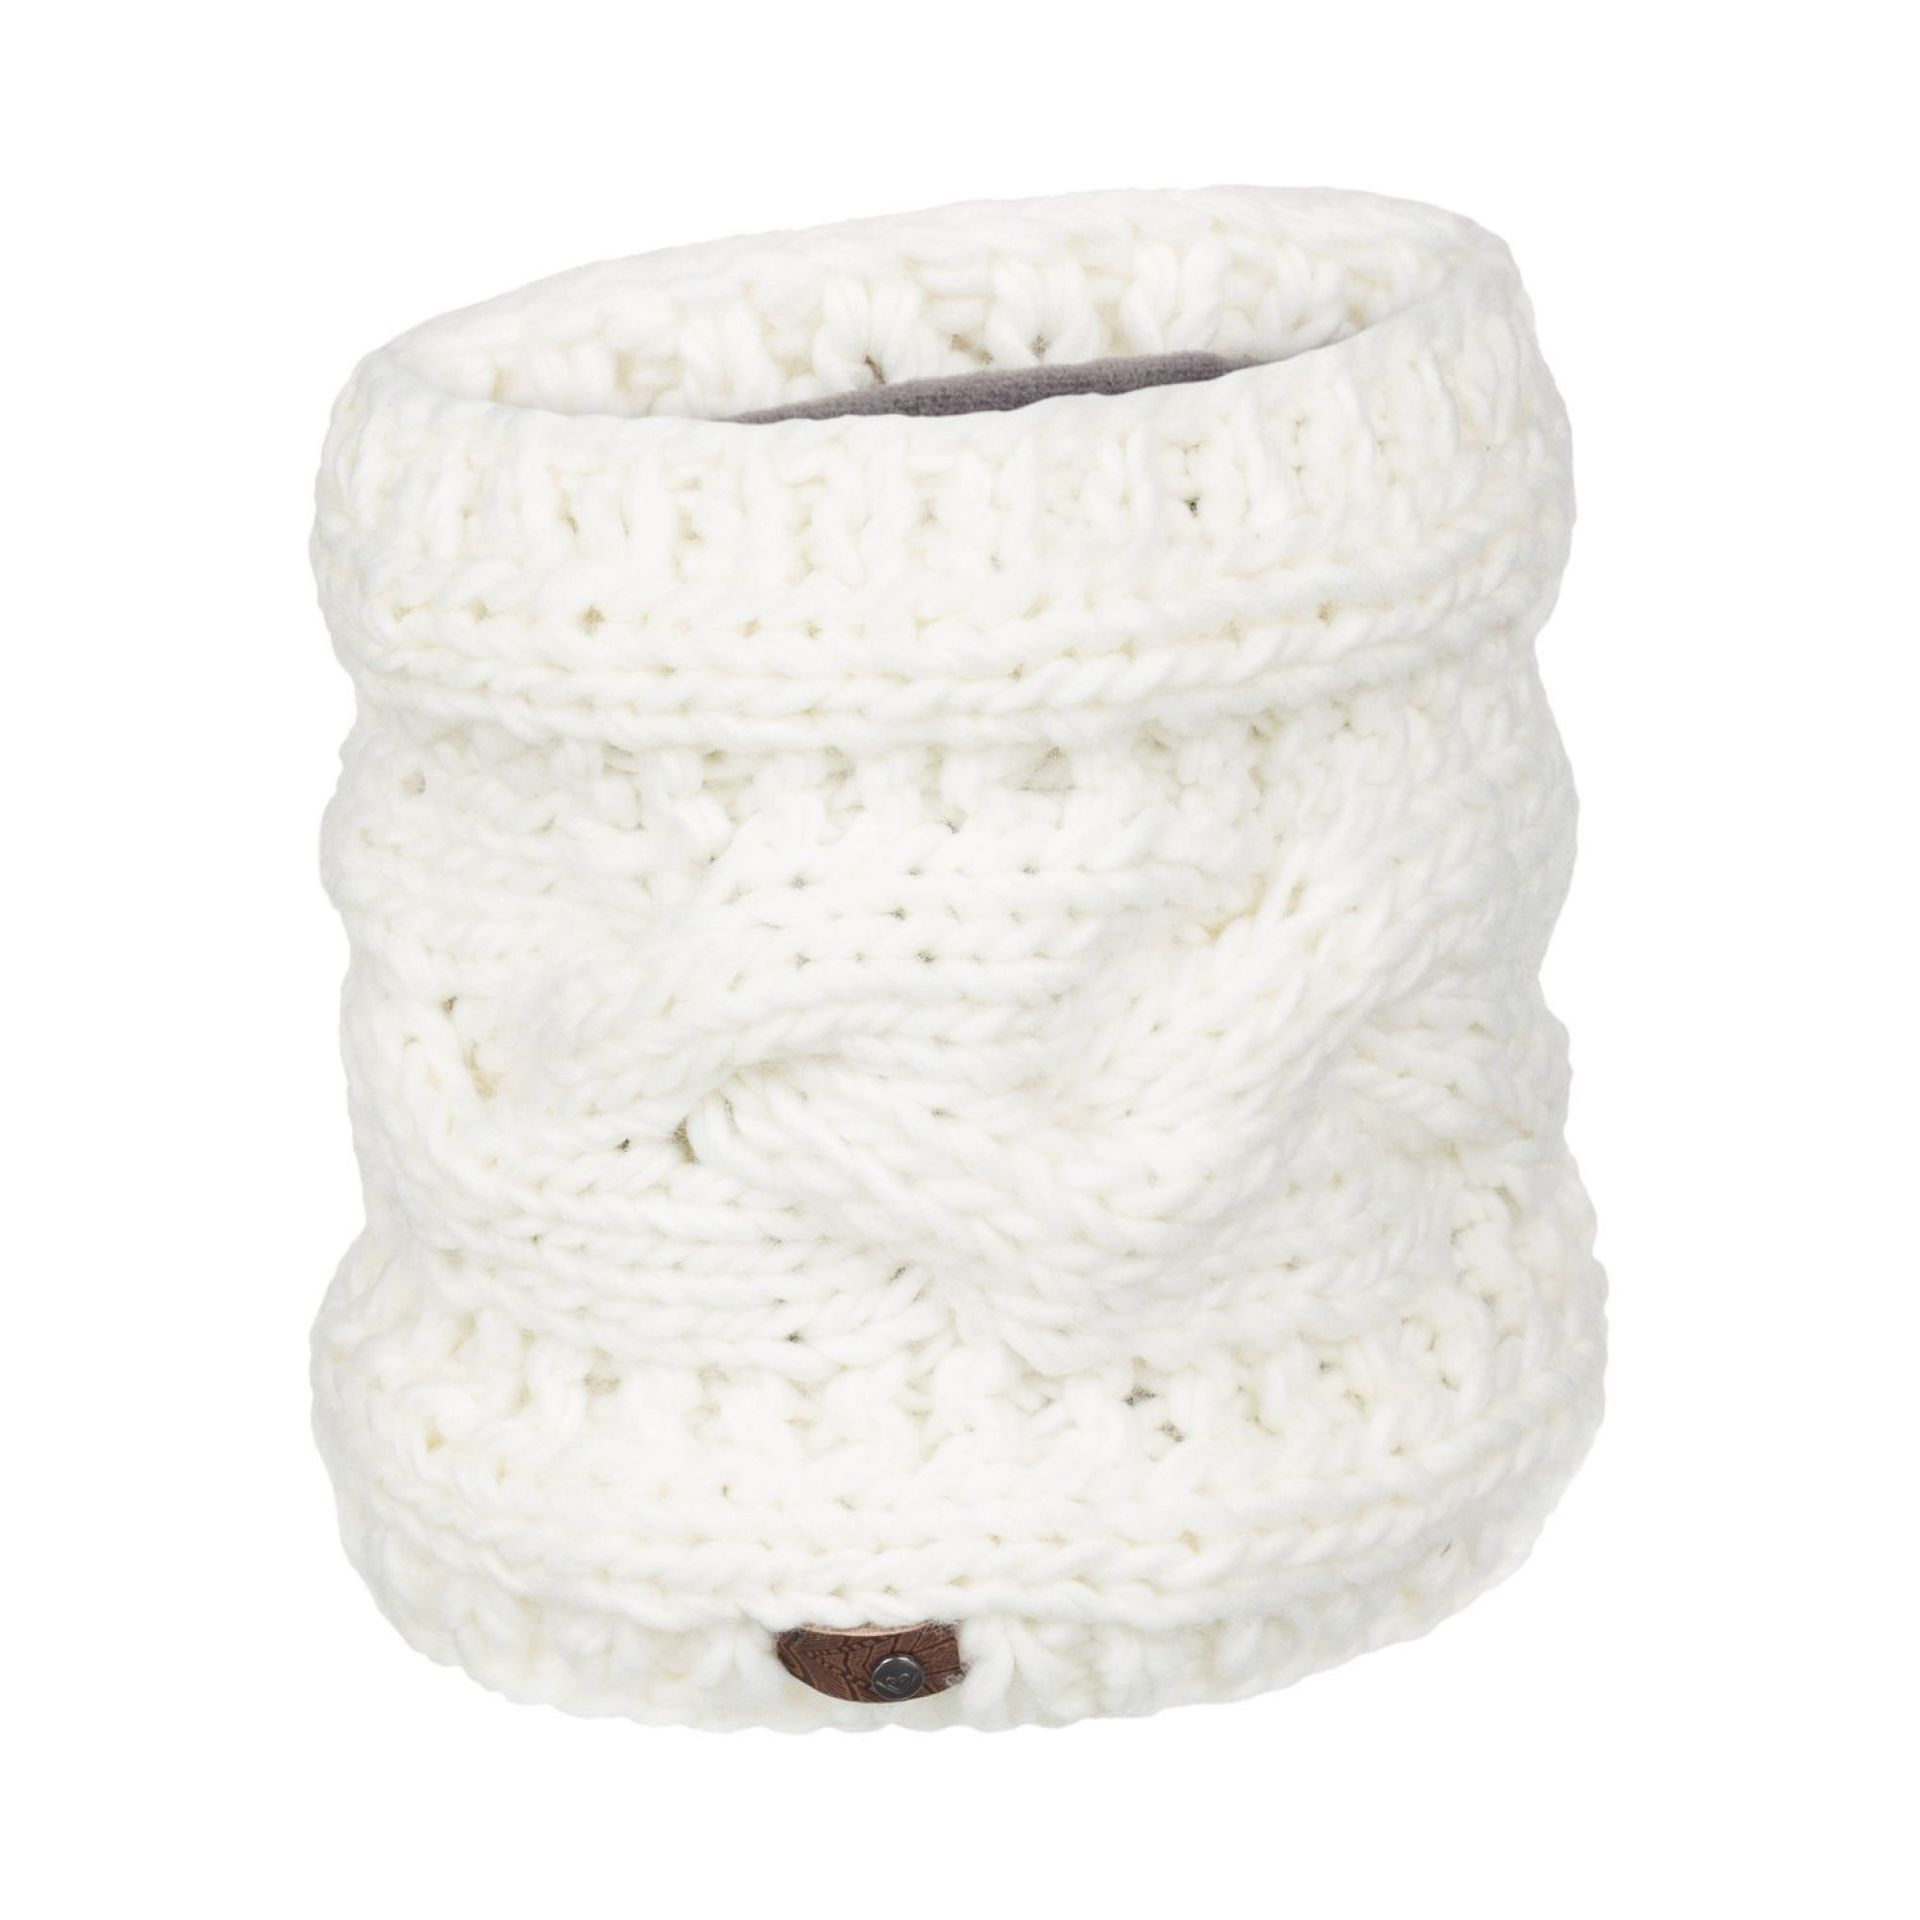 KOMIN ROXY WINTER COLLAR BRIGHT WHITE (wbb0)